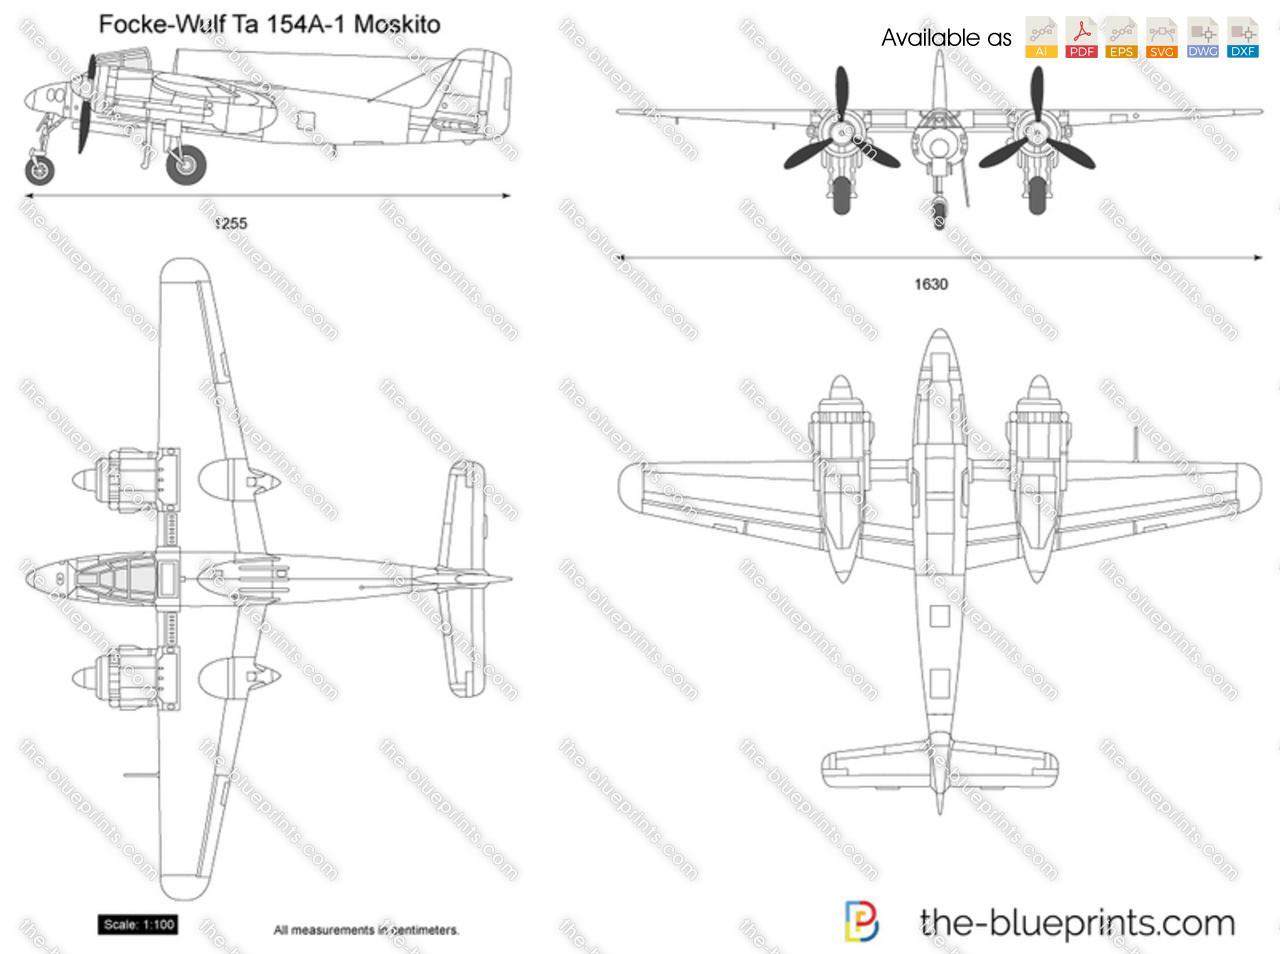 Focke-Wulf Ta 154A-1 Moskito